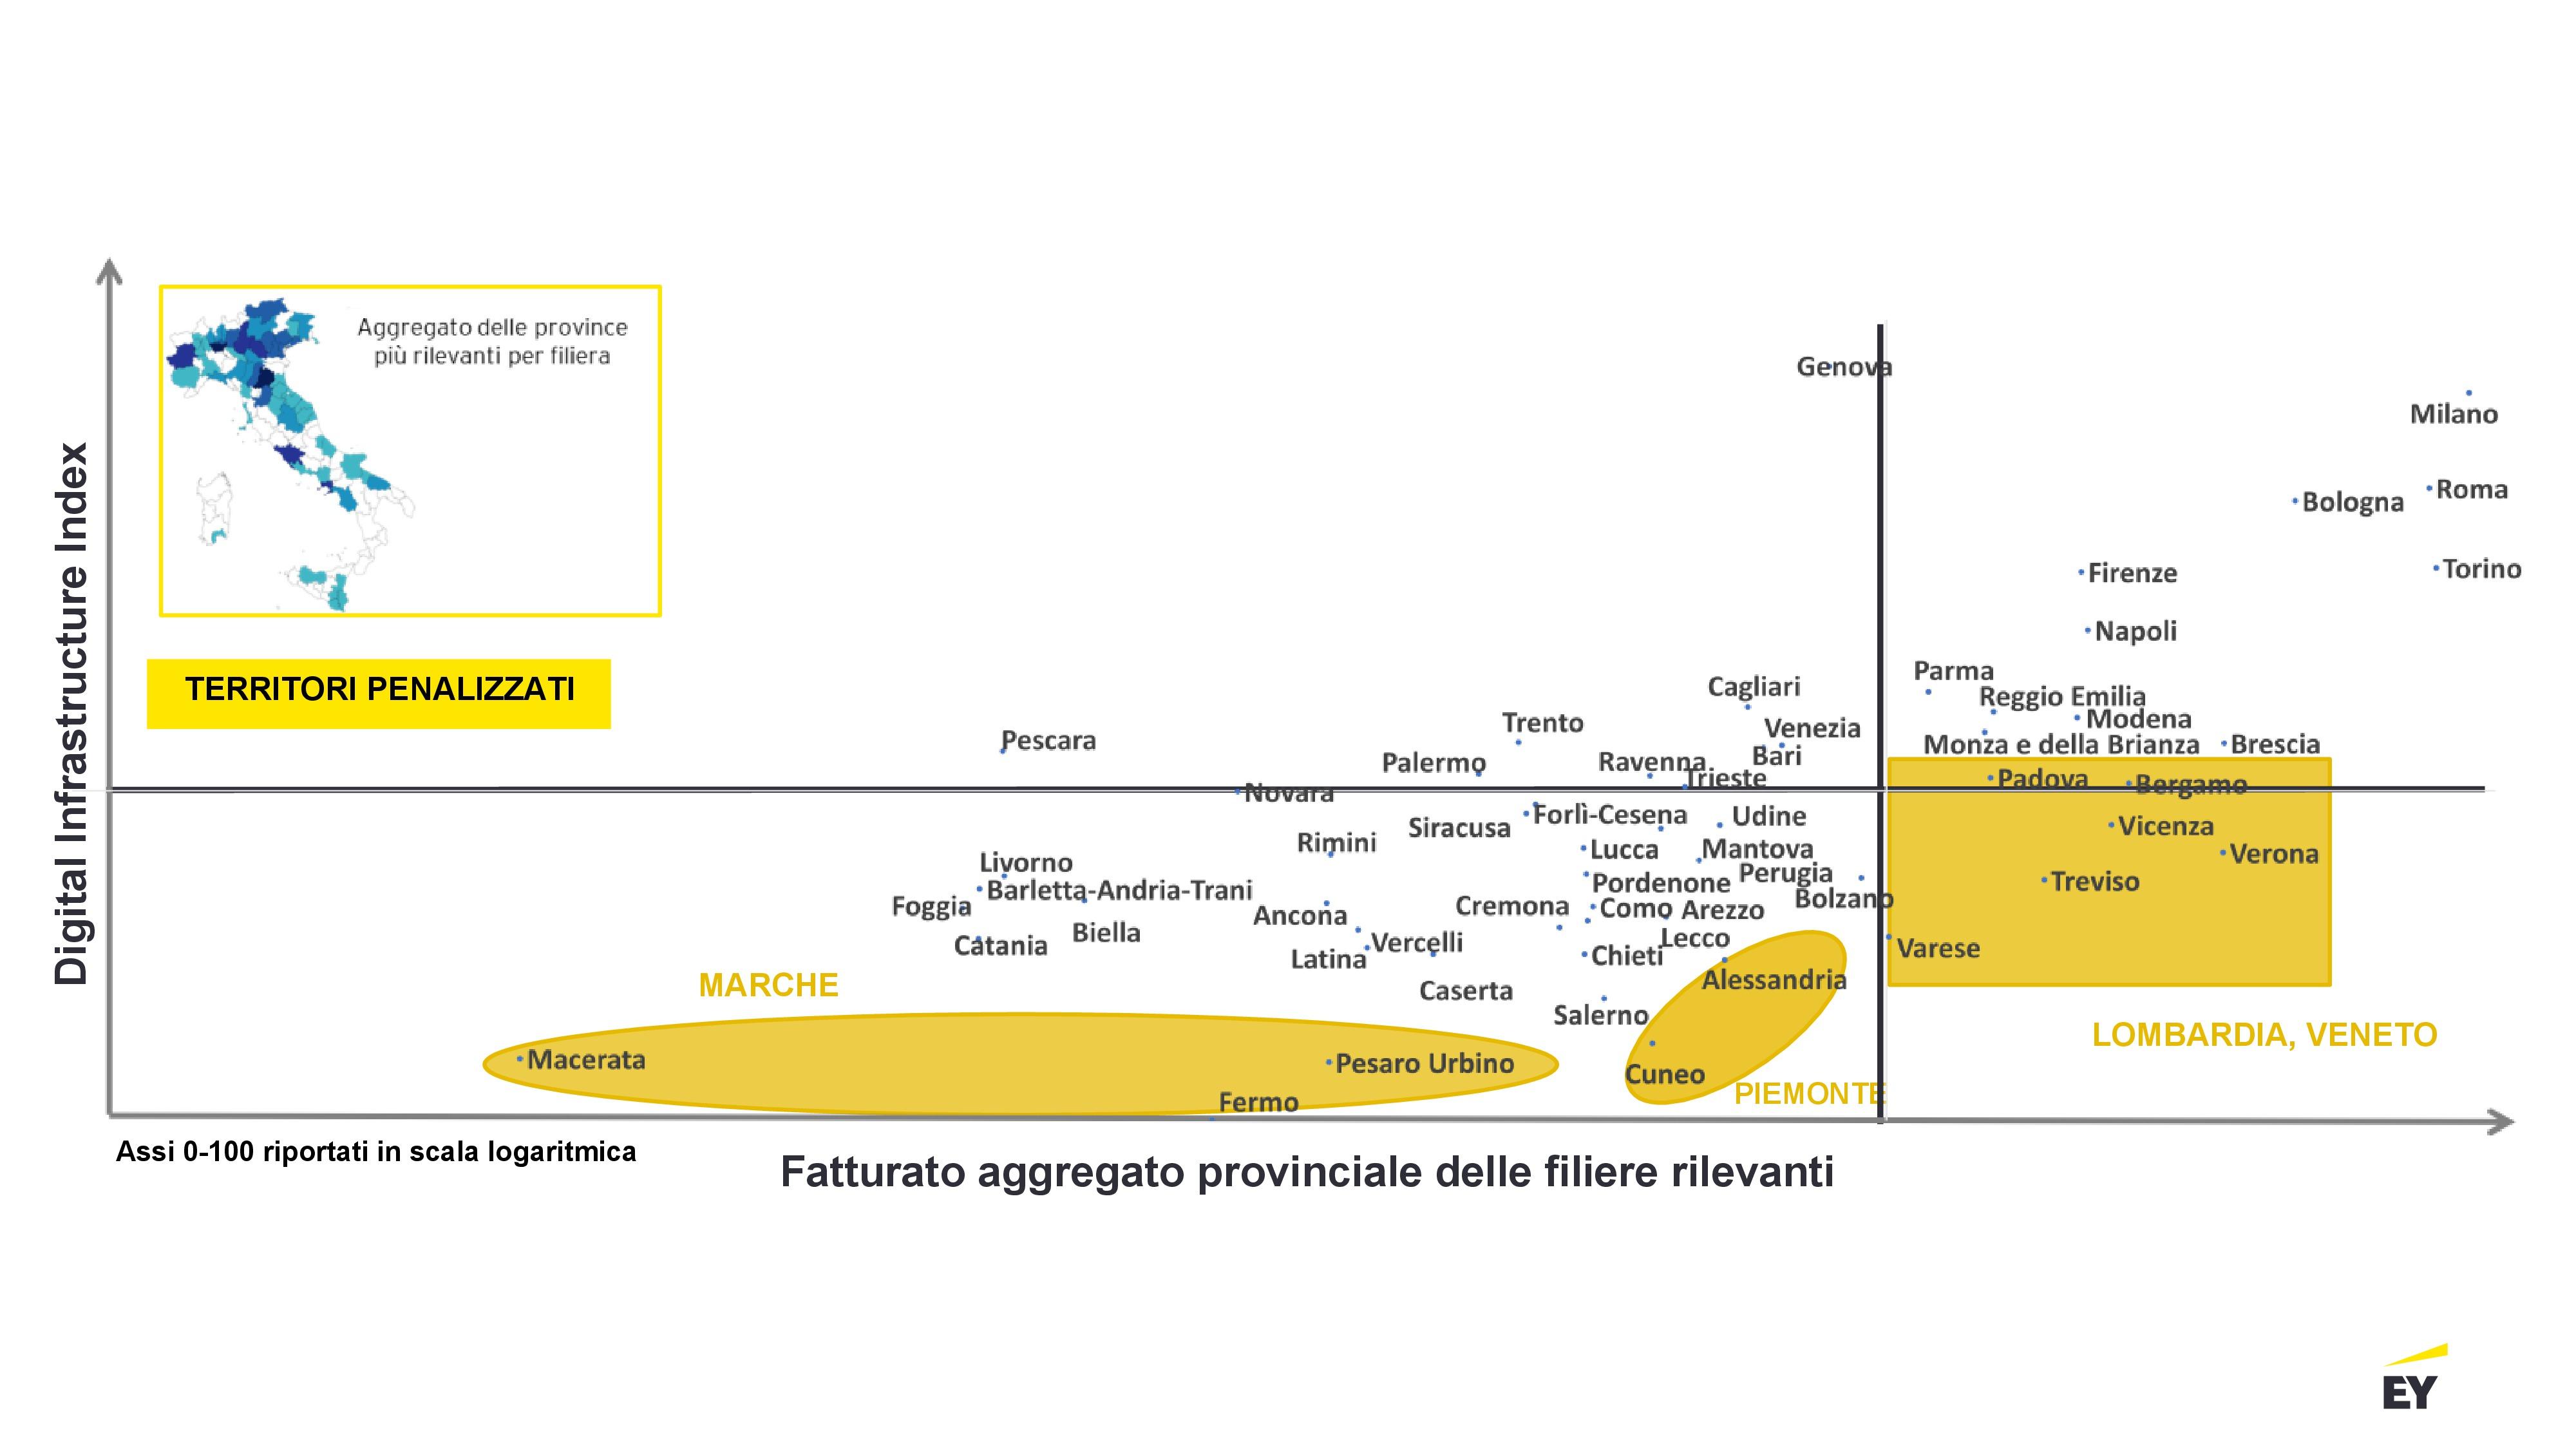 EY Digital Infrastructure Index - Filiere rilevanti